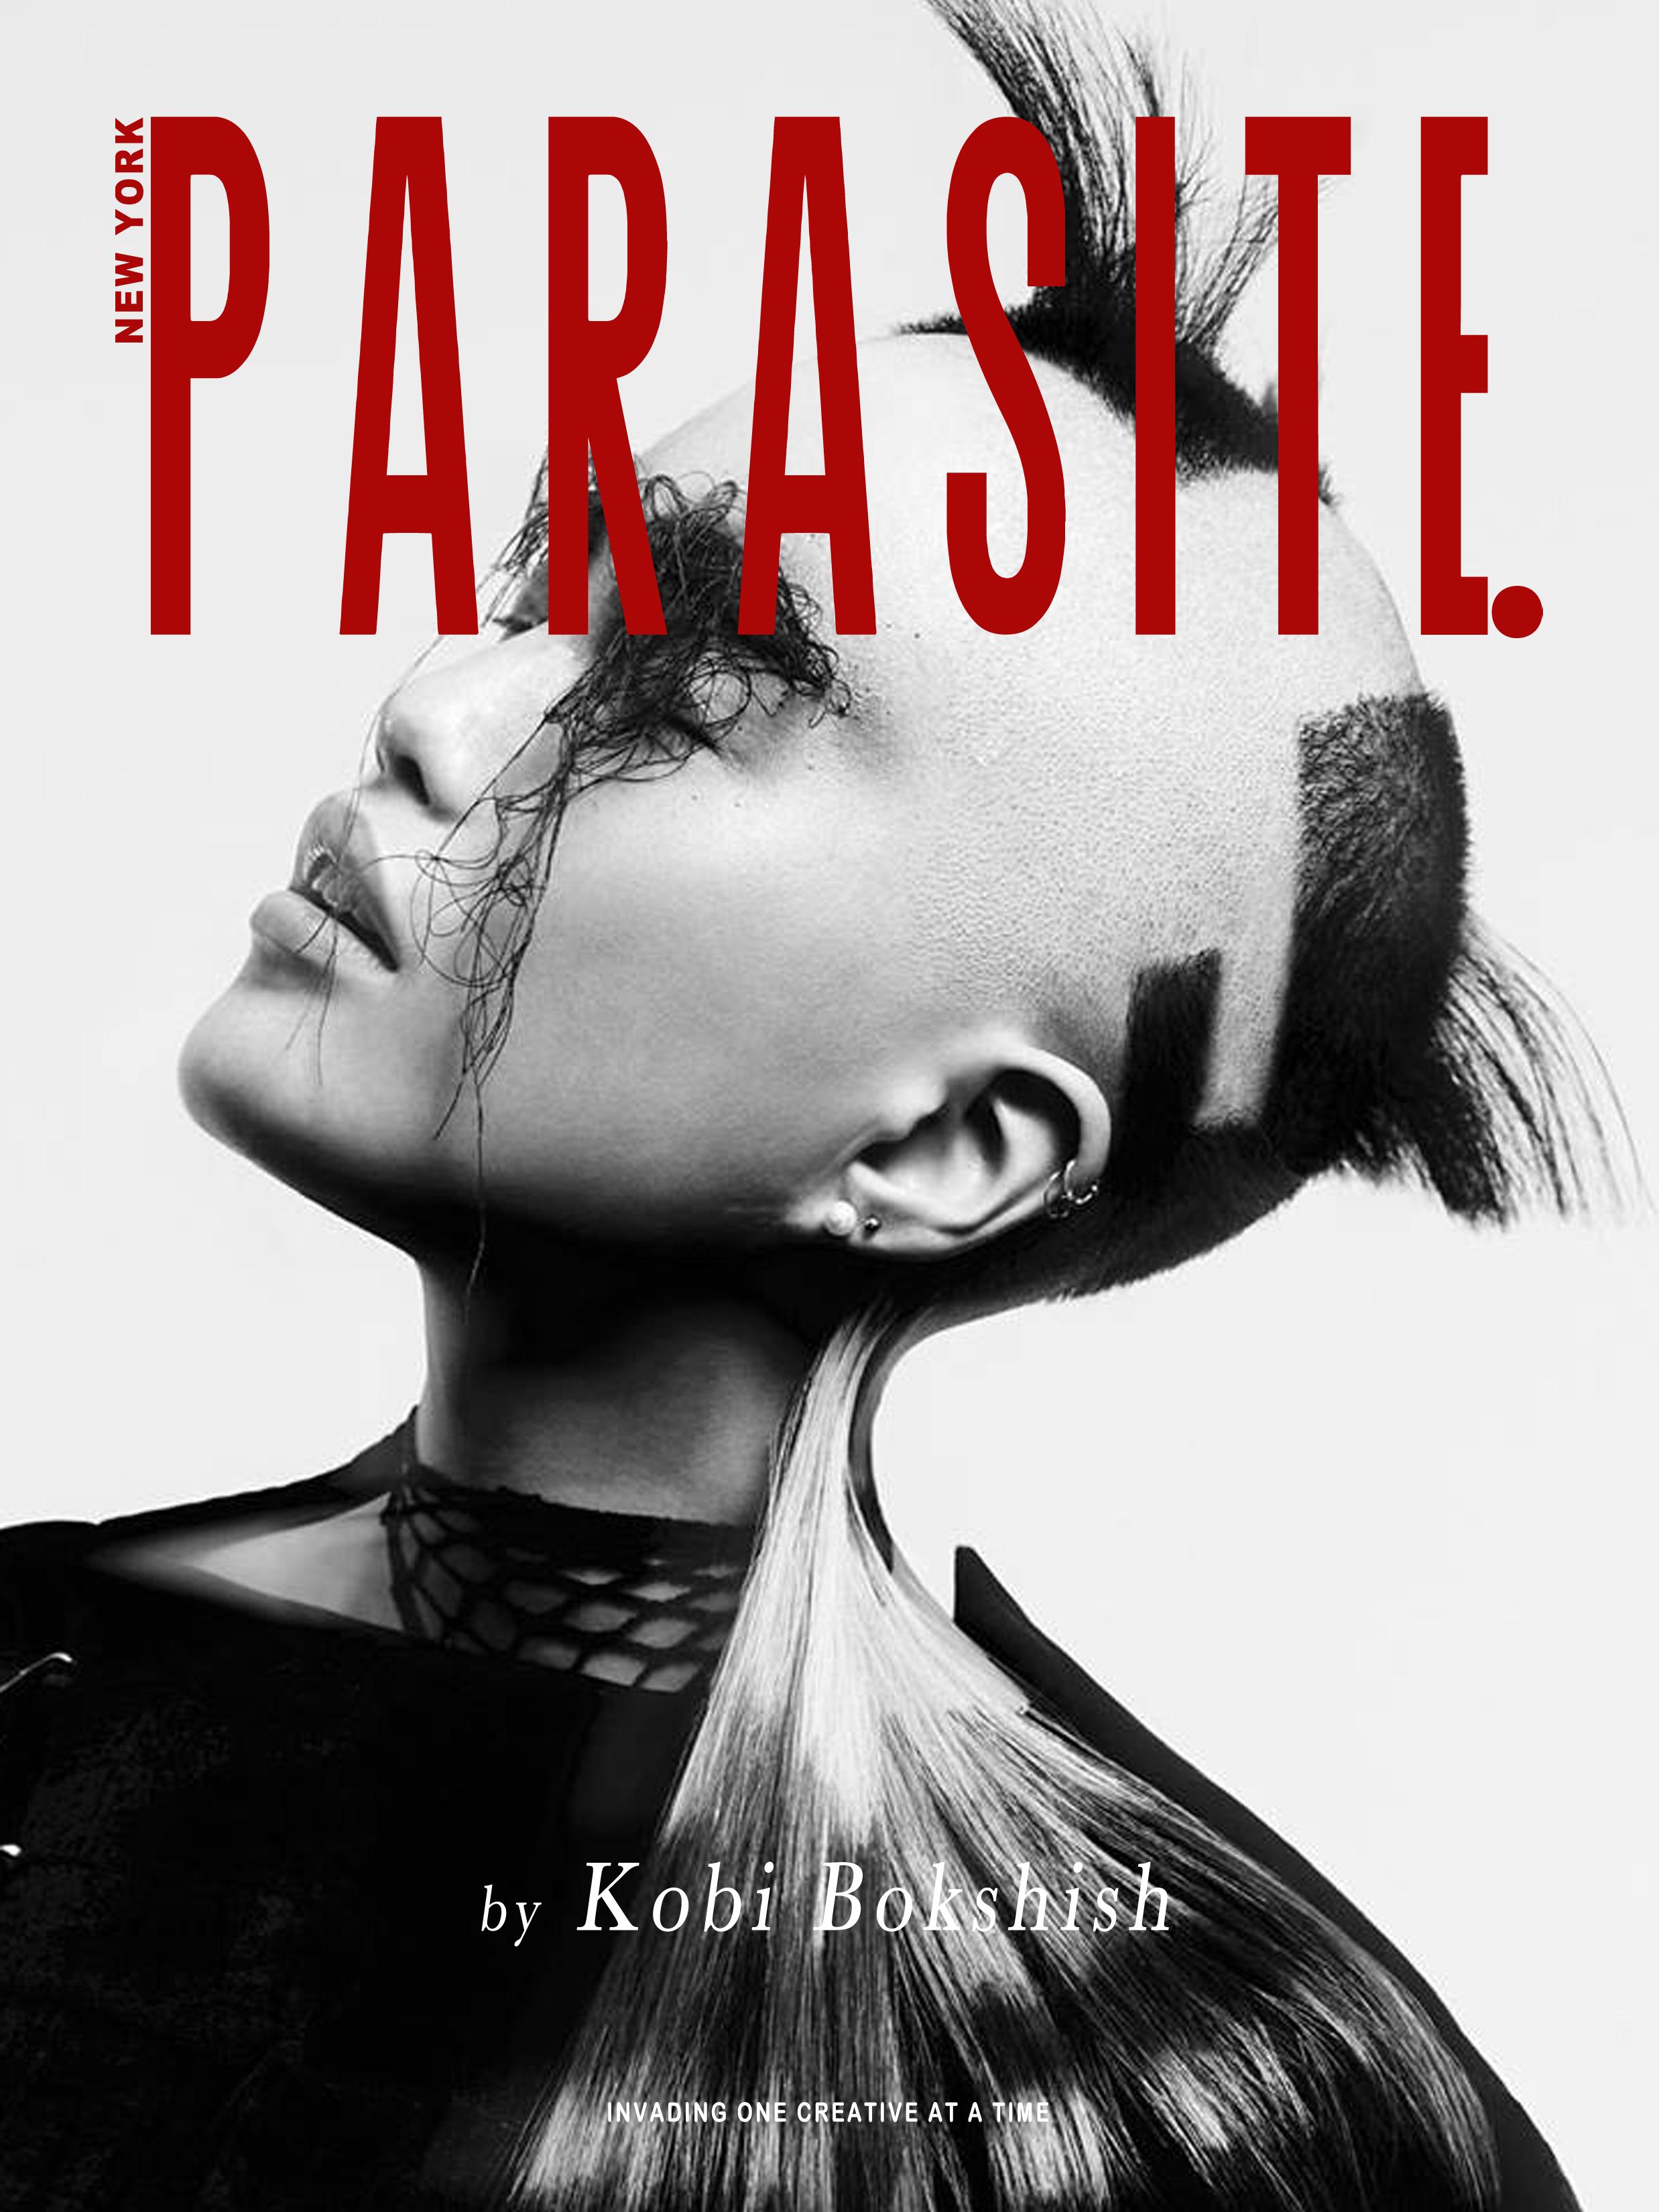 ParasiteLayout-Cover2.jpg